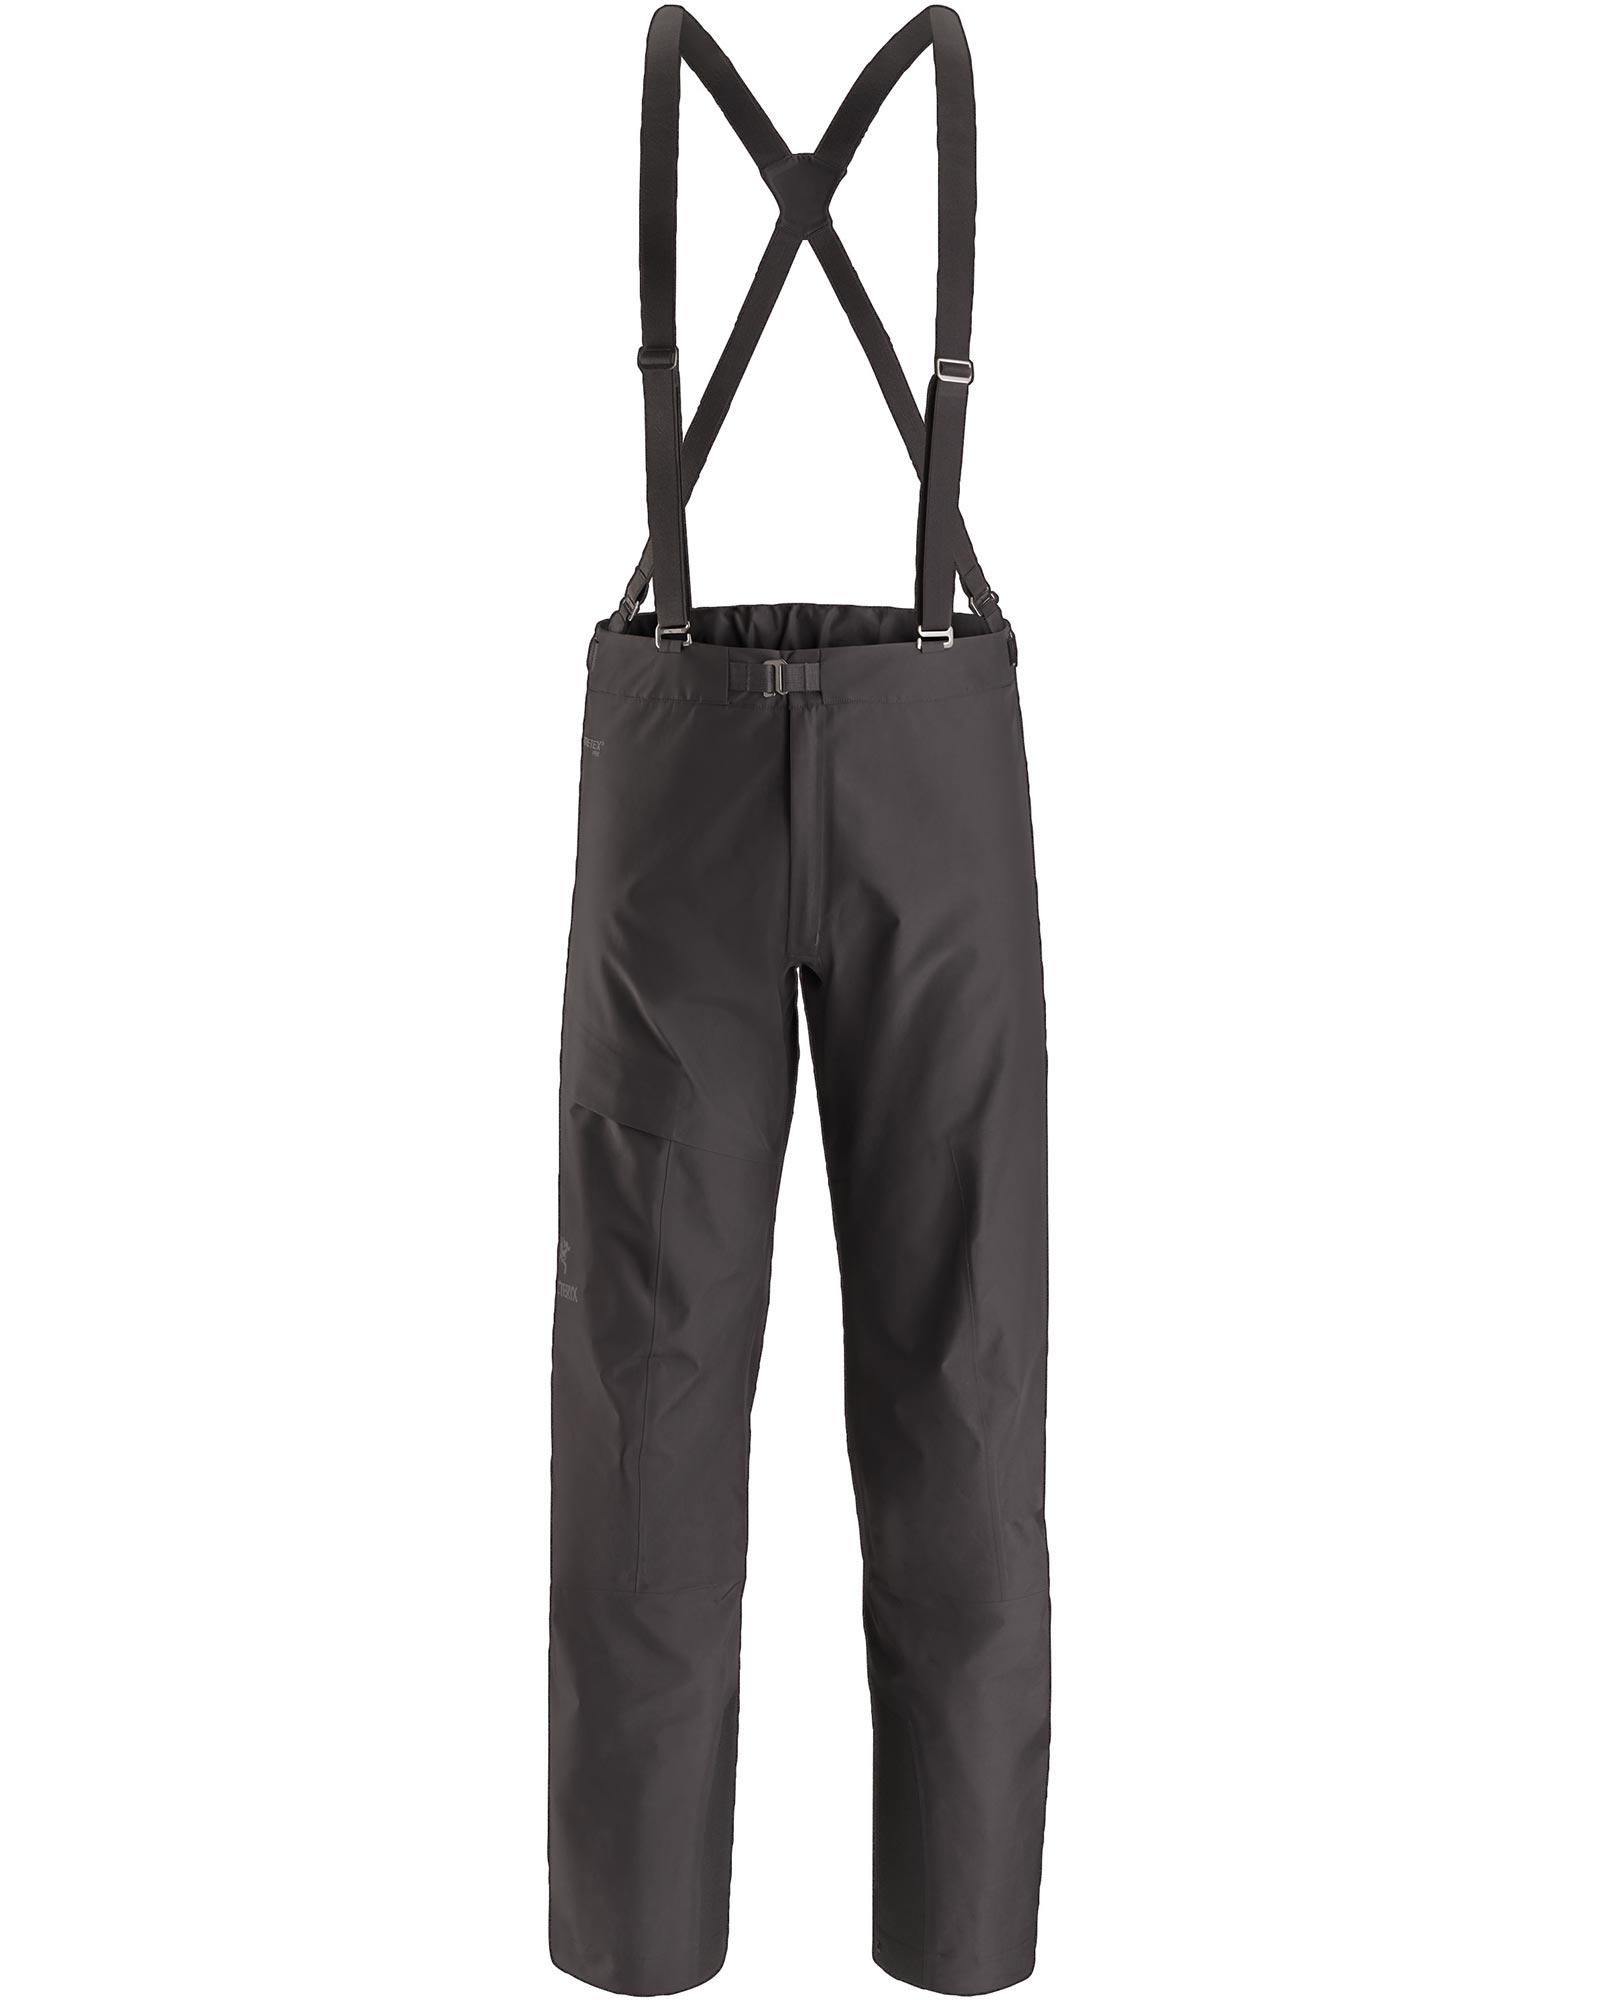 Arc'teryx Men's Alpha AR GORE-TEX Pro Pants Pilot 0